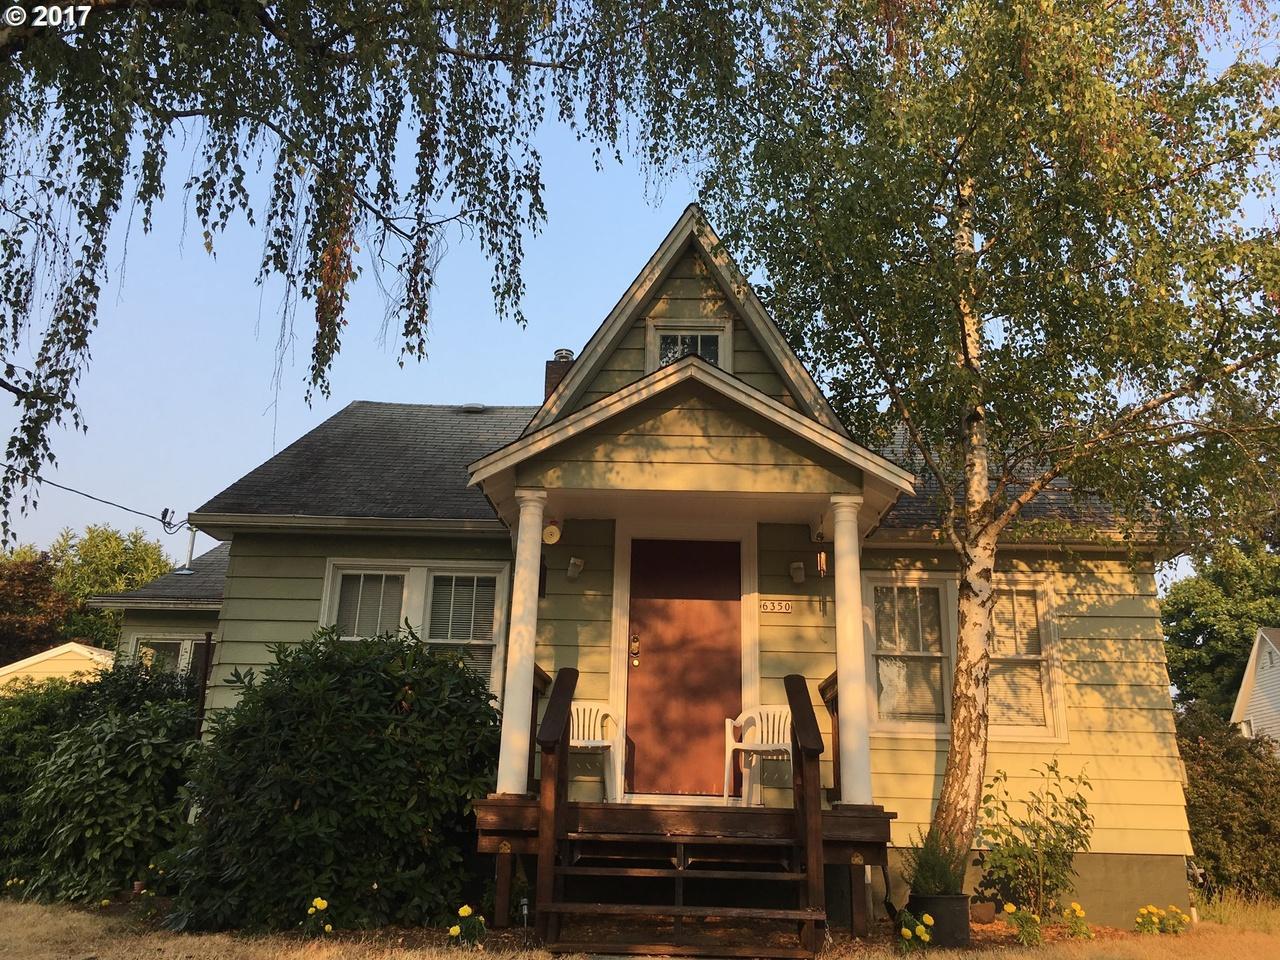 Abbott House Sumner Bed Breakfast 6350 N Vancouver Ave Portland Or 97217 Mls 17306463 Redfin